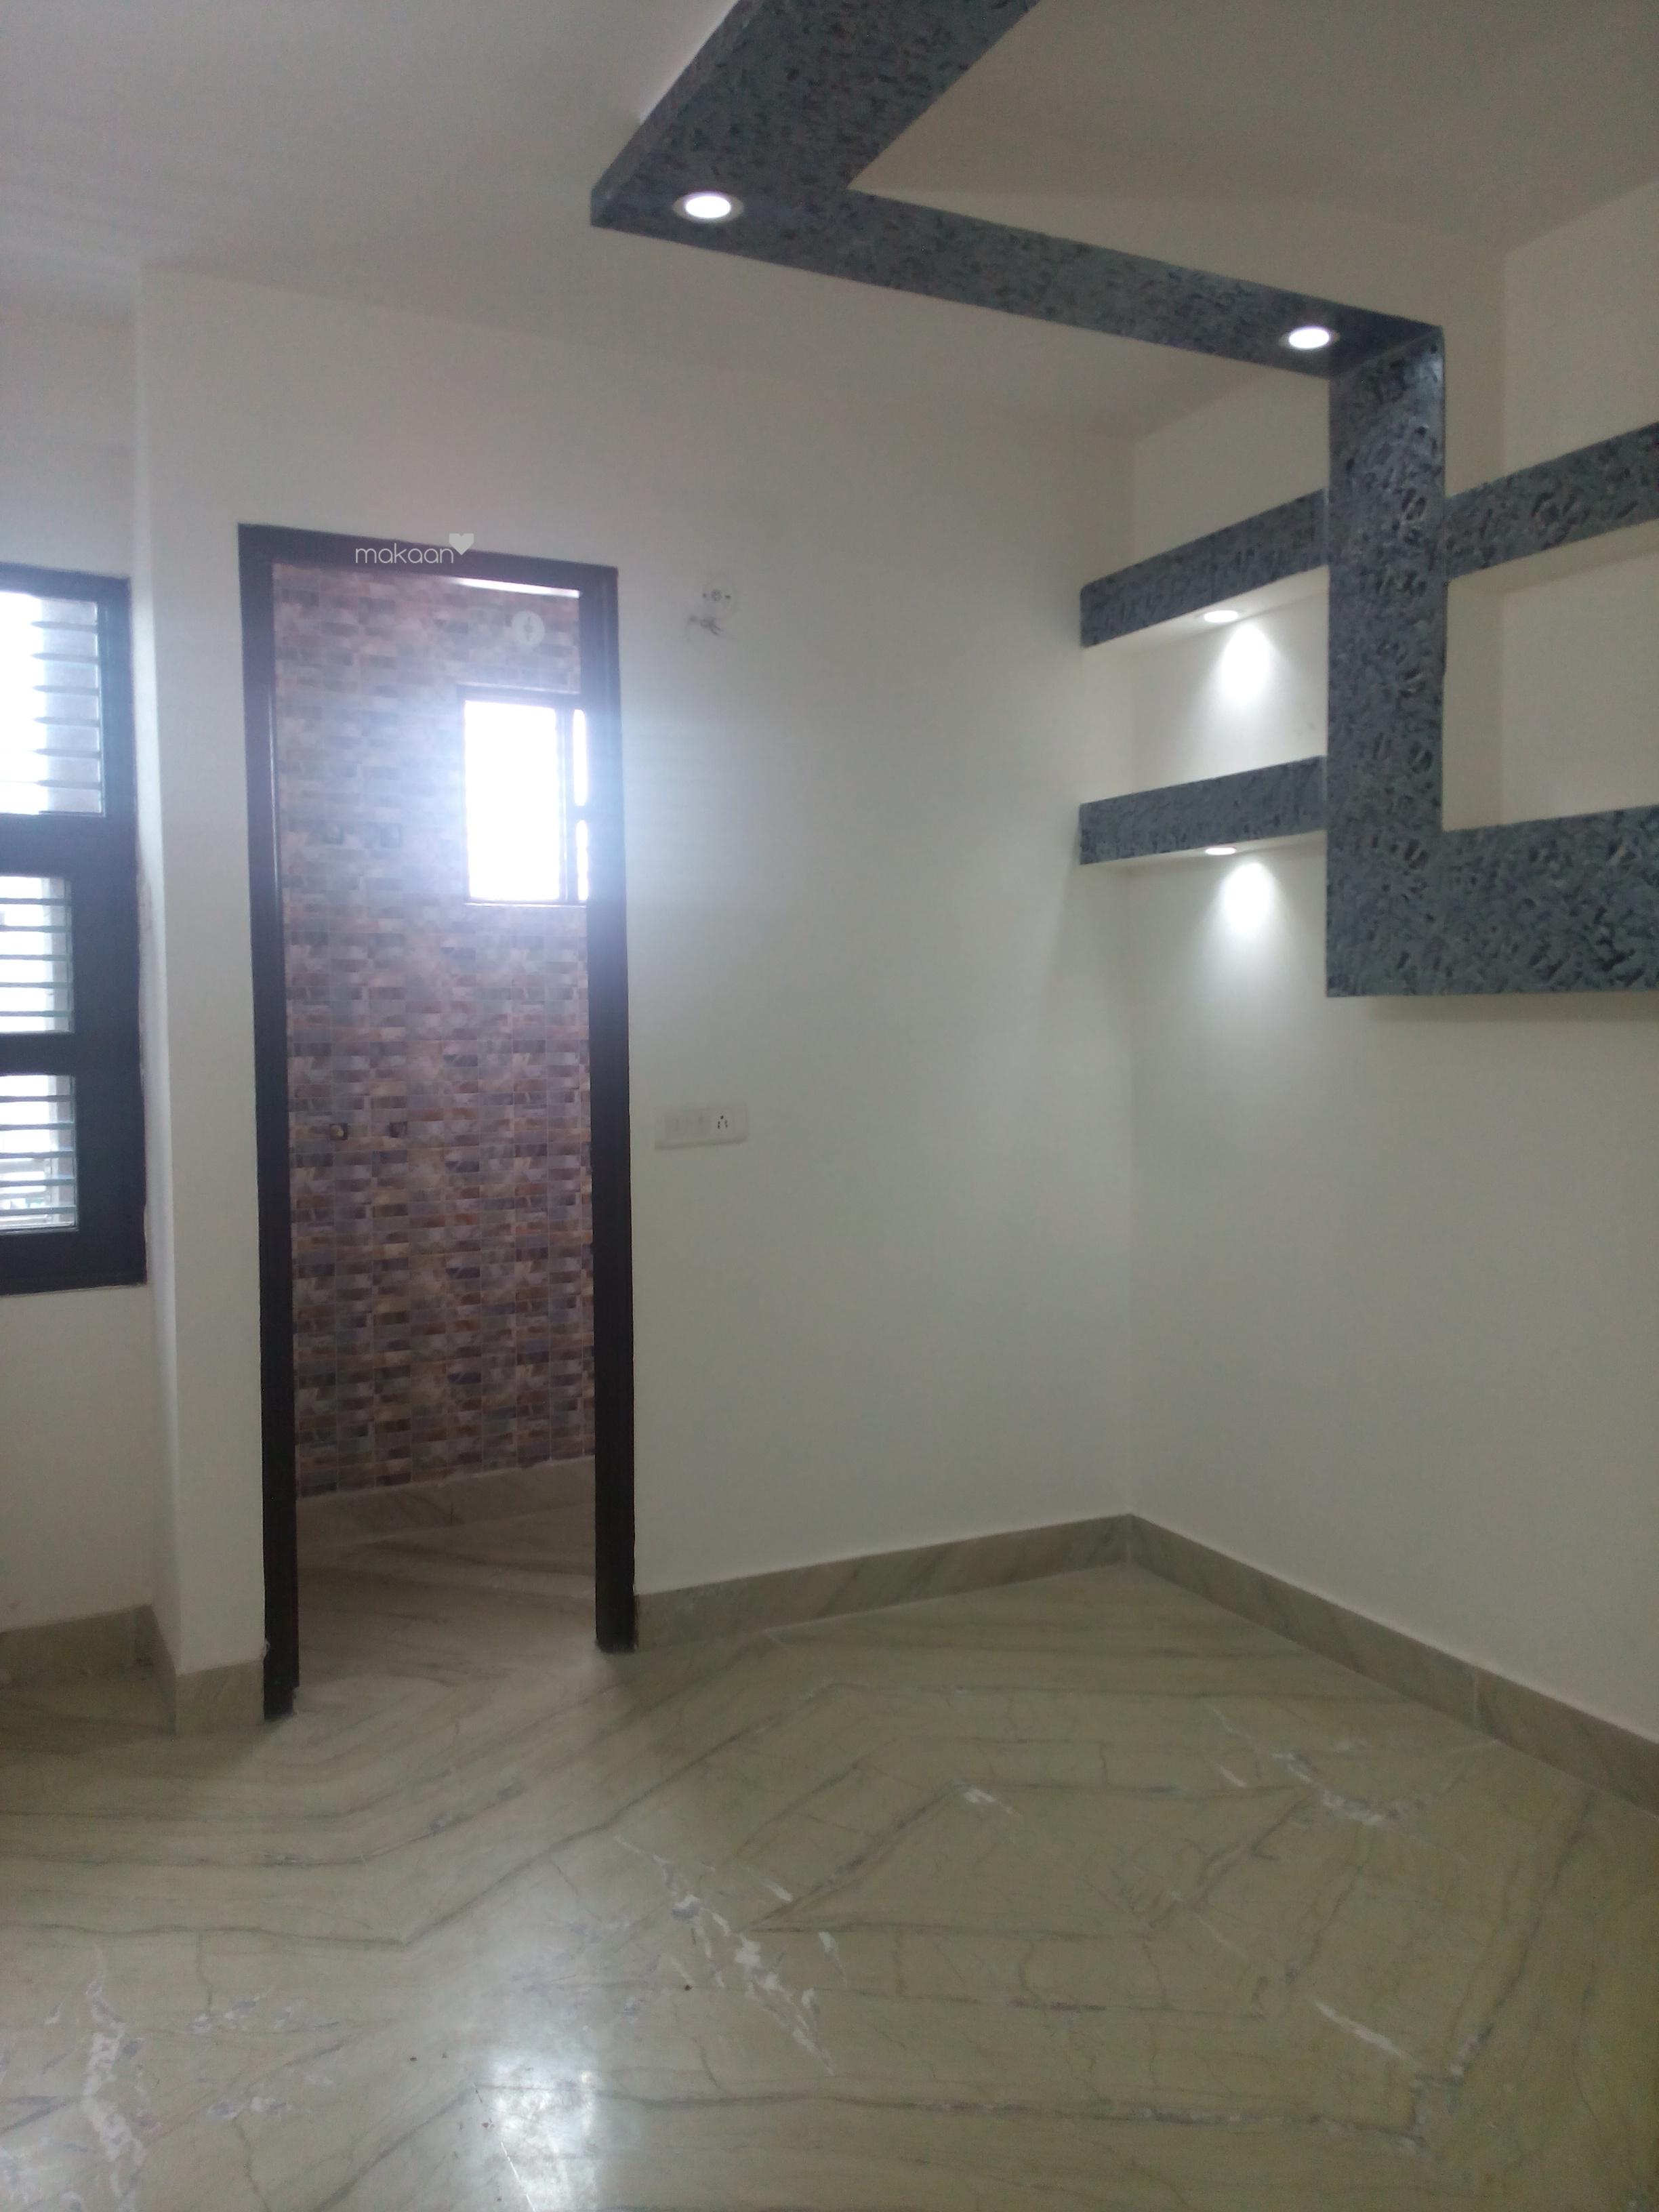 738 sq ft 3BHK 3BHK+2T (738 sq ft) + Pooja Room Property By Global Real Estate In GLOBEHOMES, Sainik Nagar